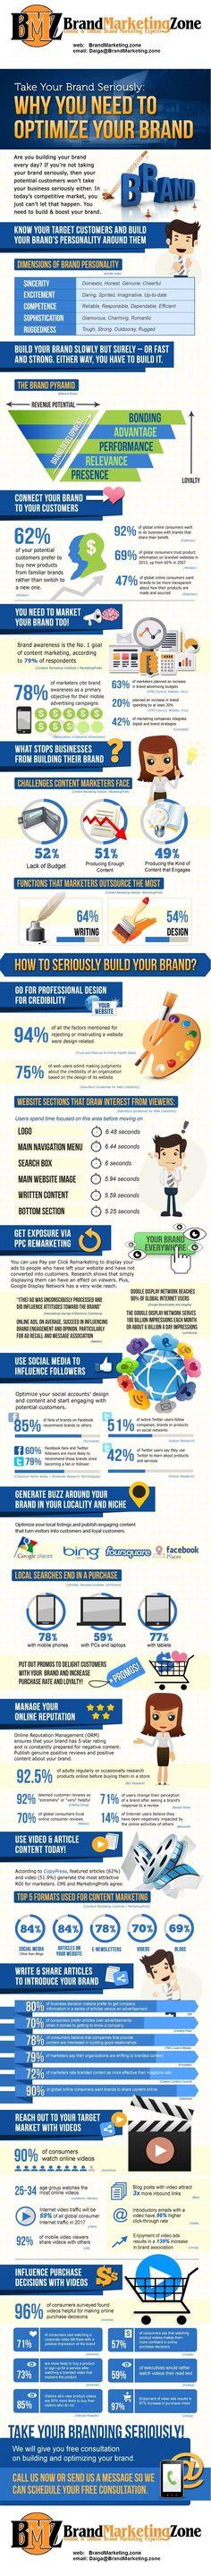 Brand Marketing Zone Brand Optimization Infographic